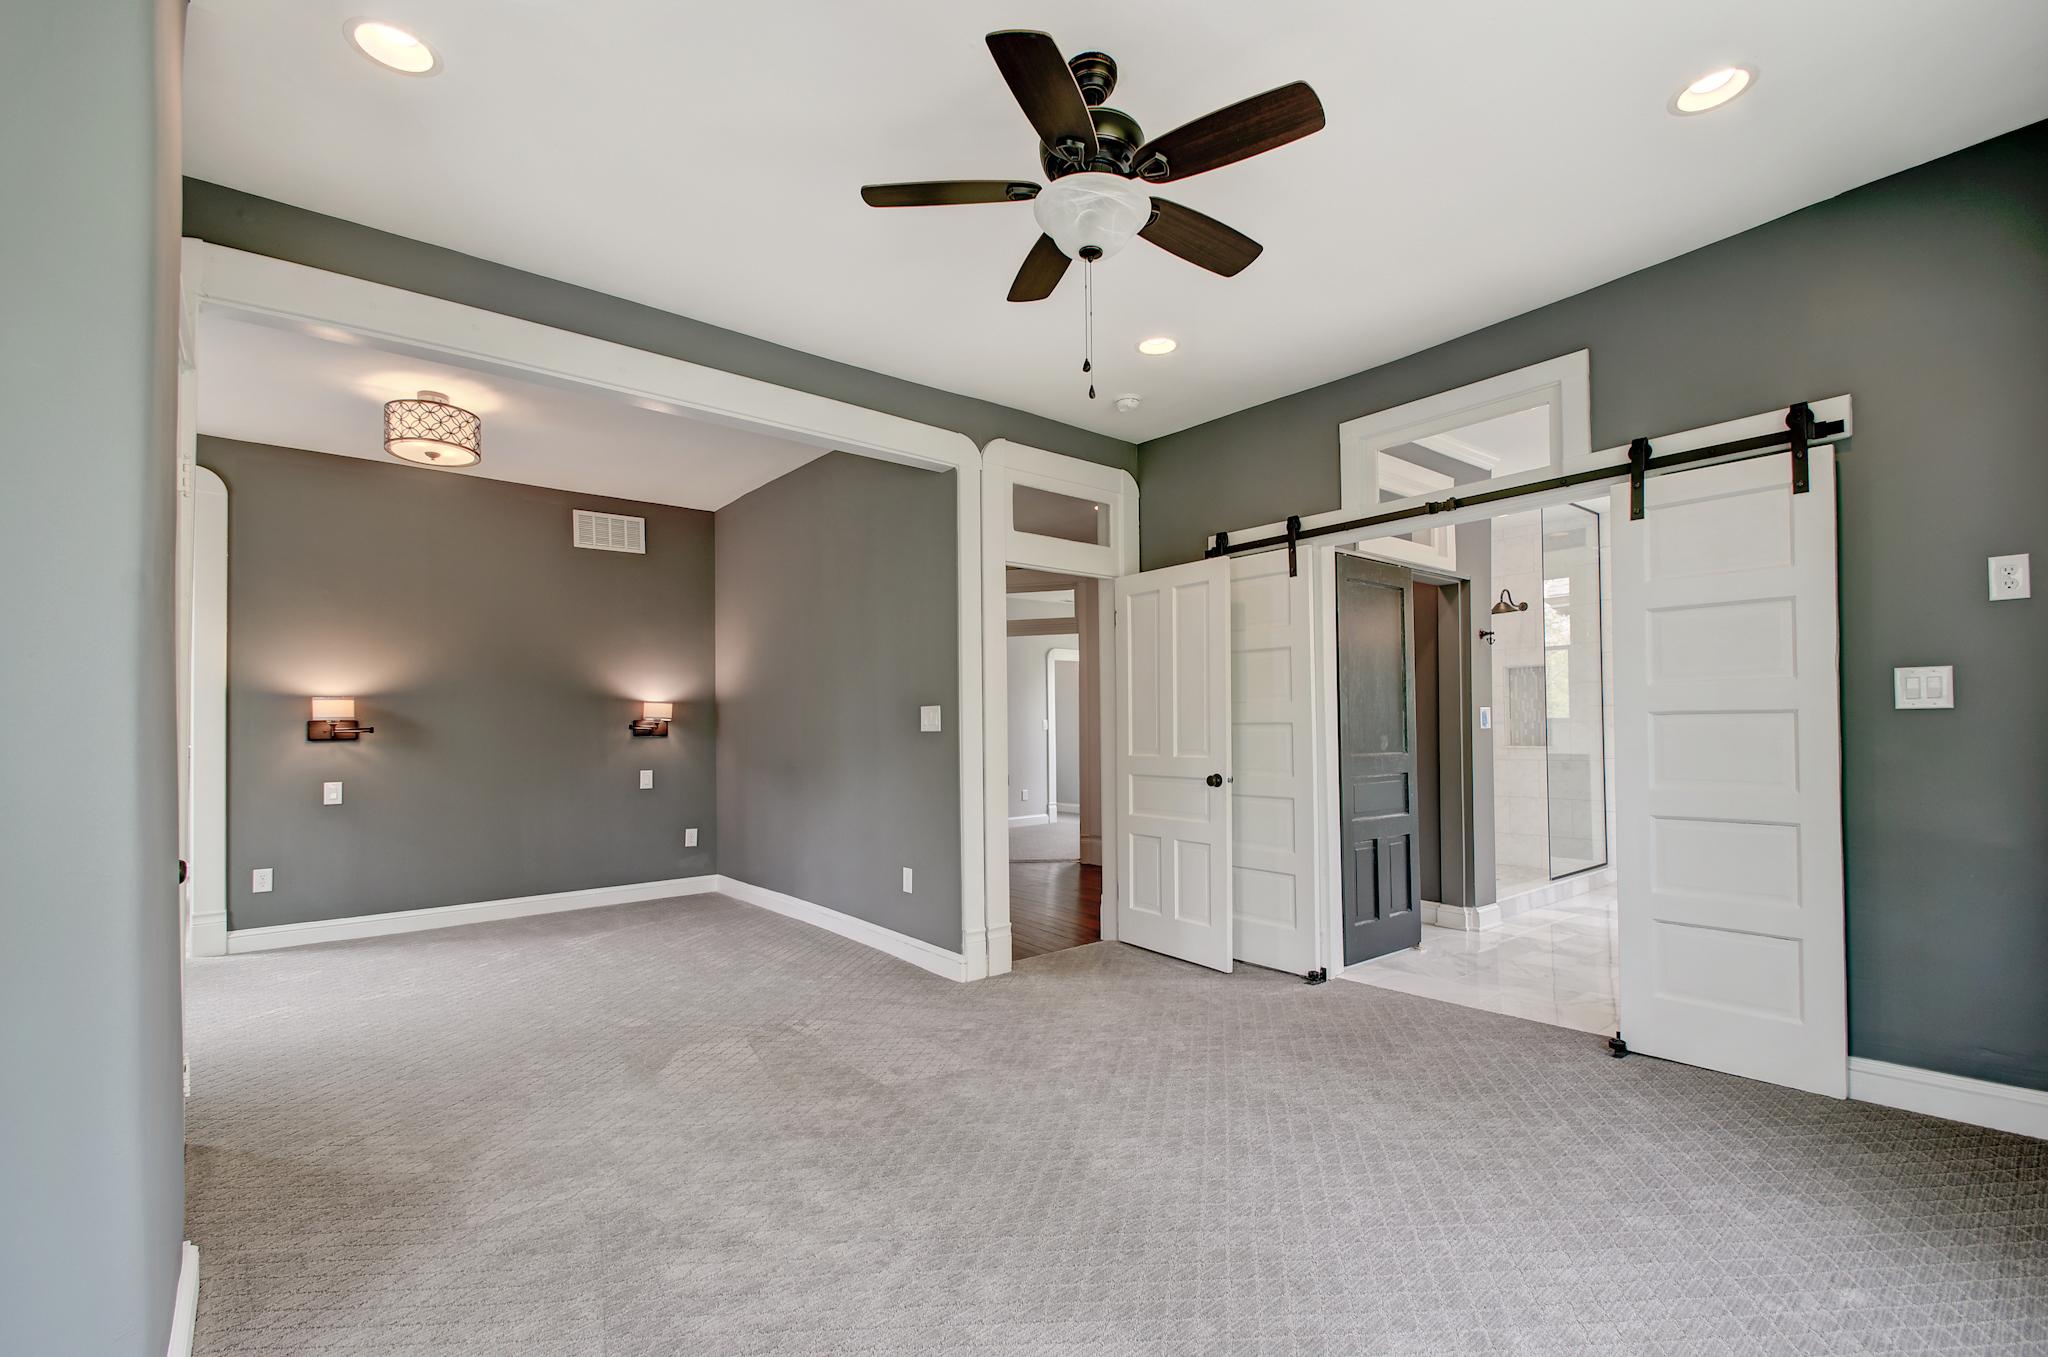 13-Master Bedroom View 3.jpg